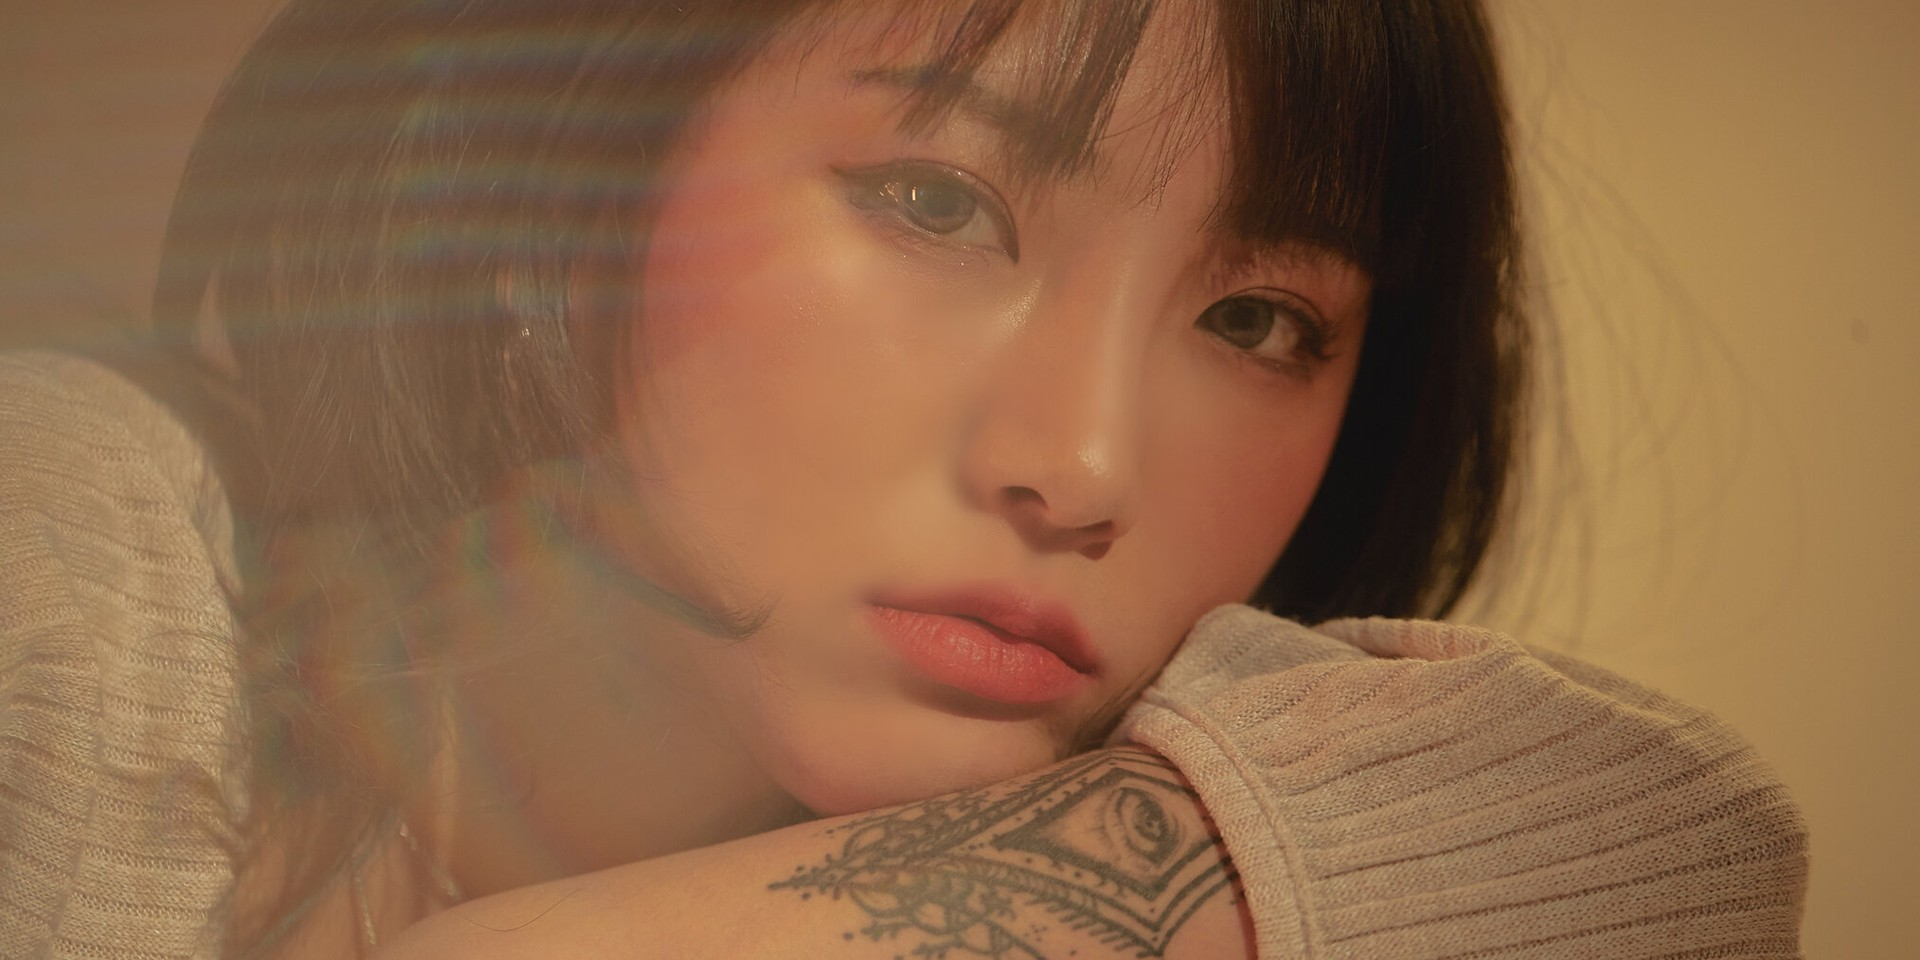 Introducing: Korean singer-songwriter LEEBADA on unleashing her inner self through music